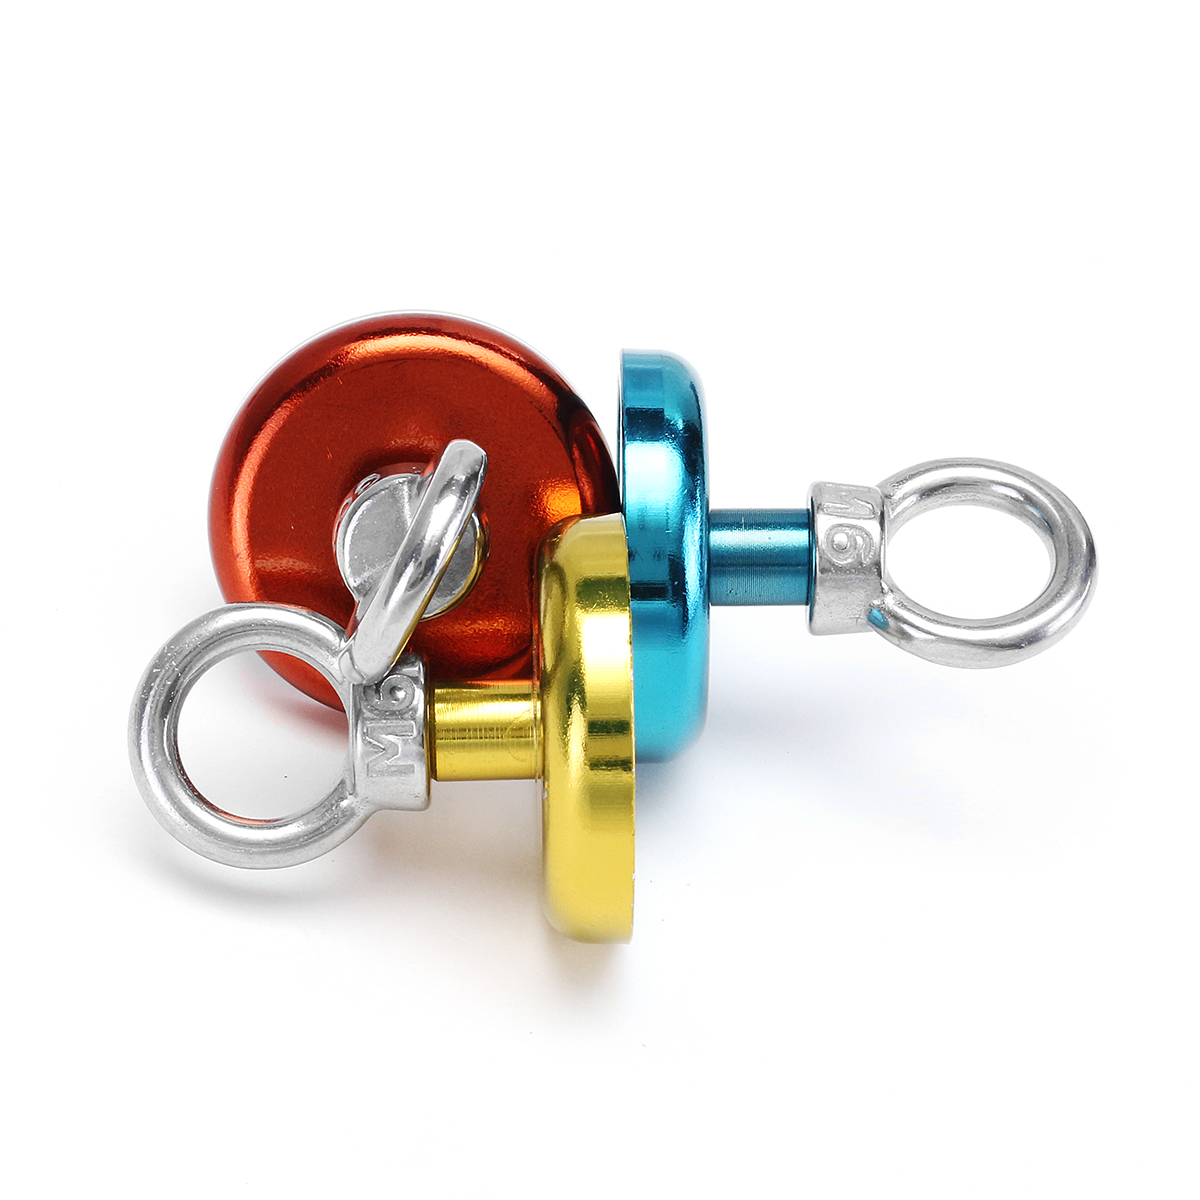 Neodymium Magnets 42mm 68kg Eyebolt Circular Ring Magnet Neodymium Recovery Magnet Metal Detector